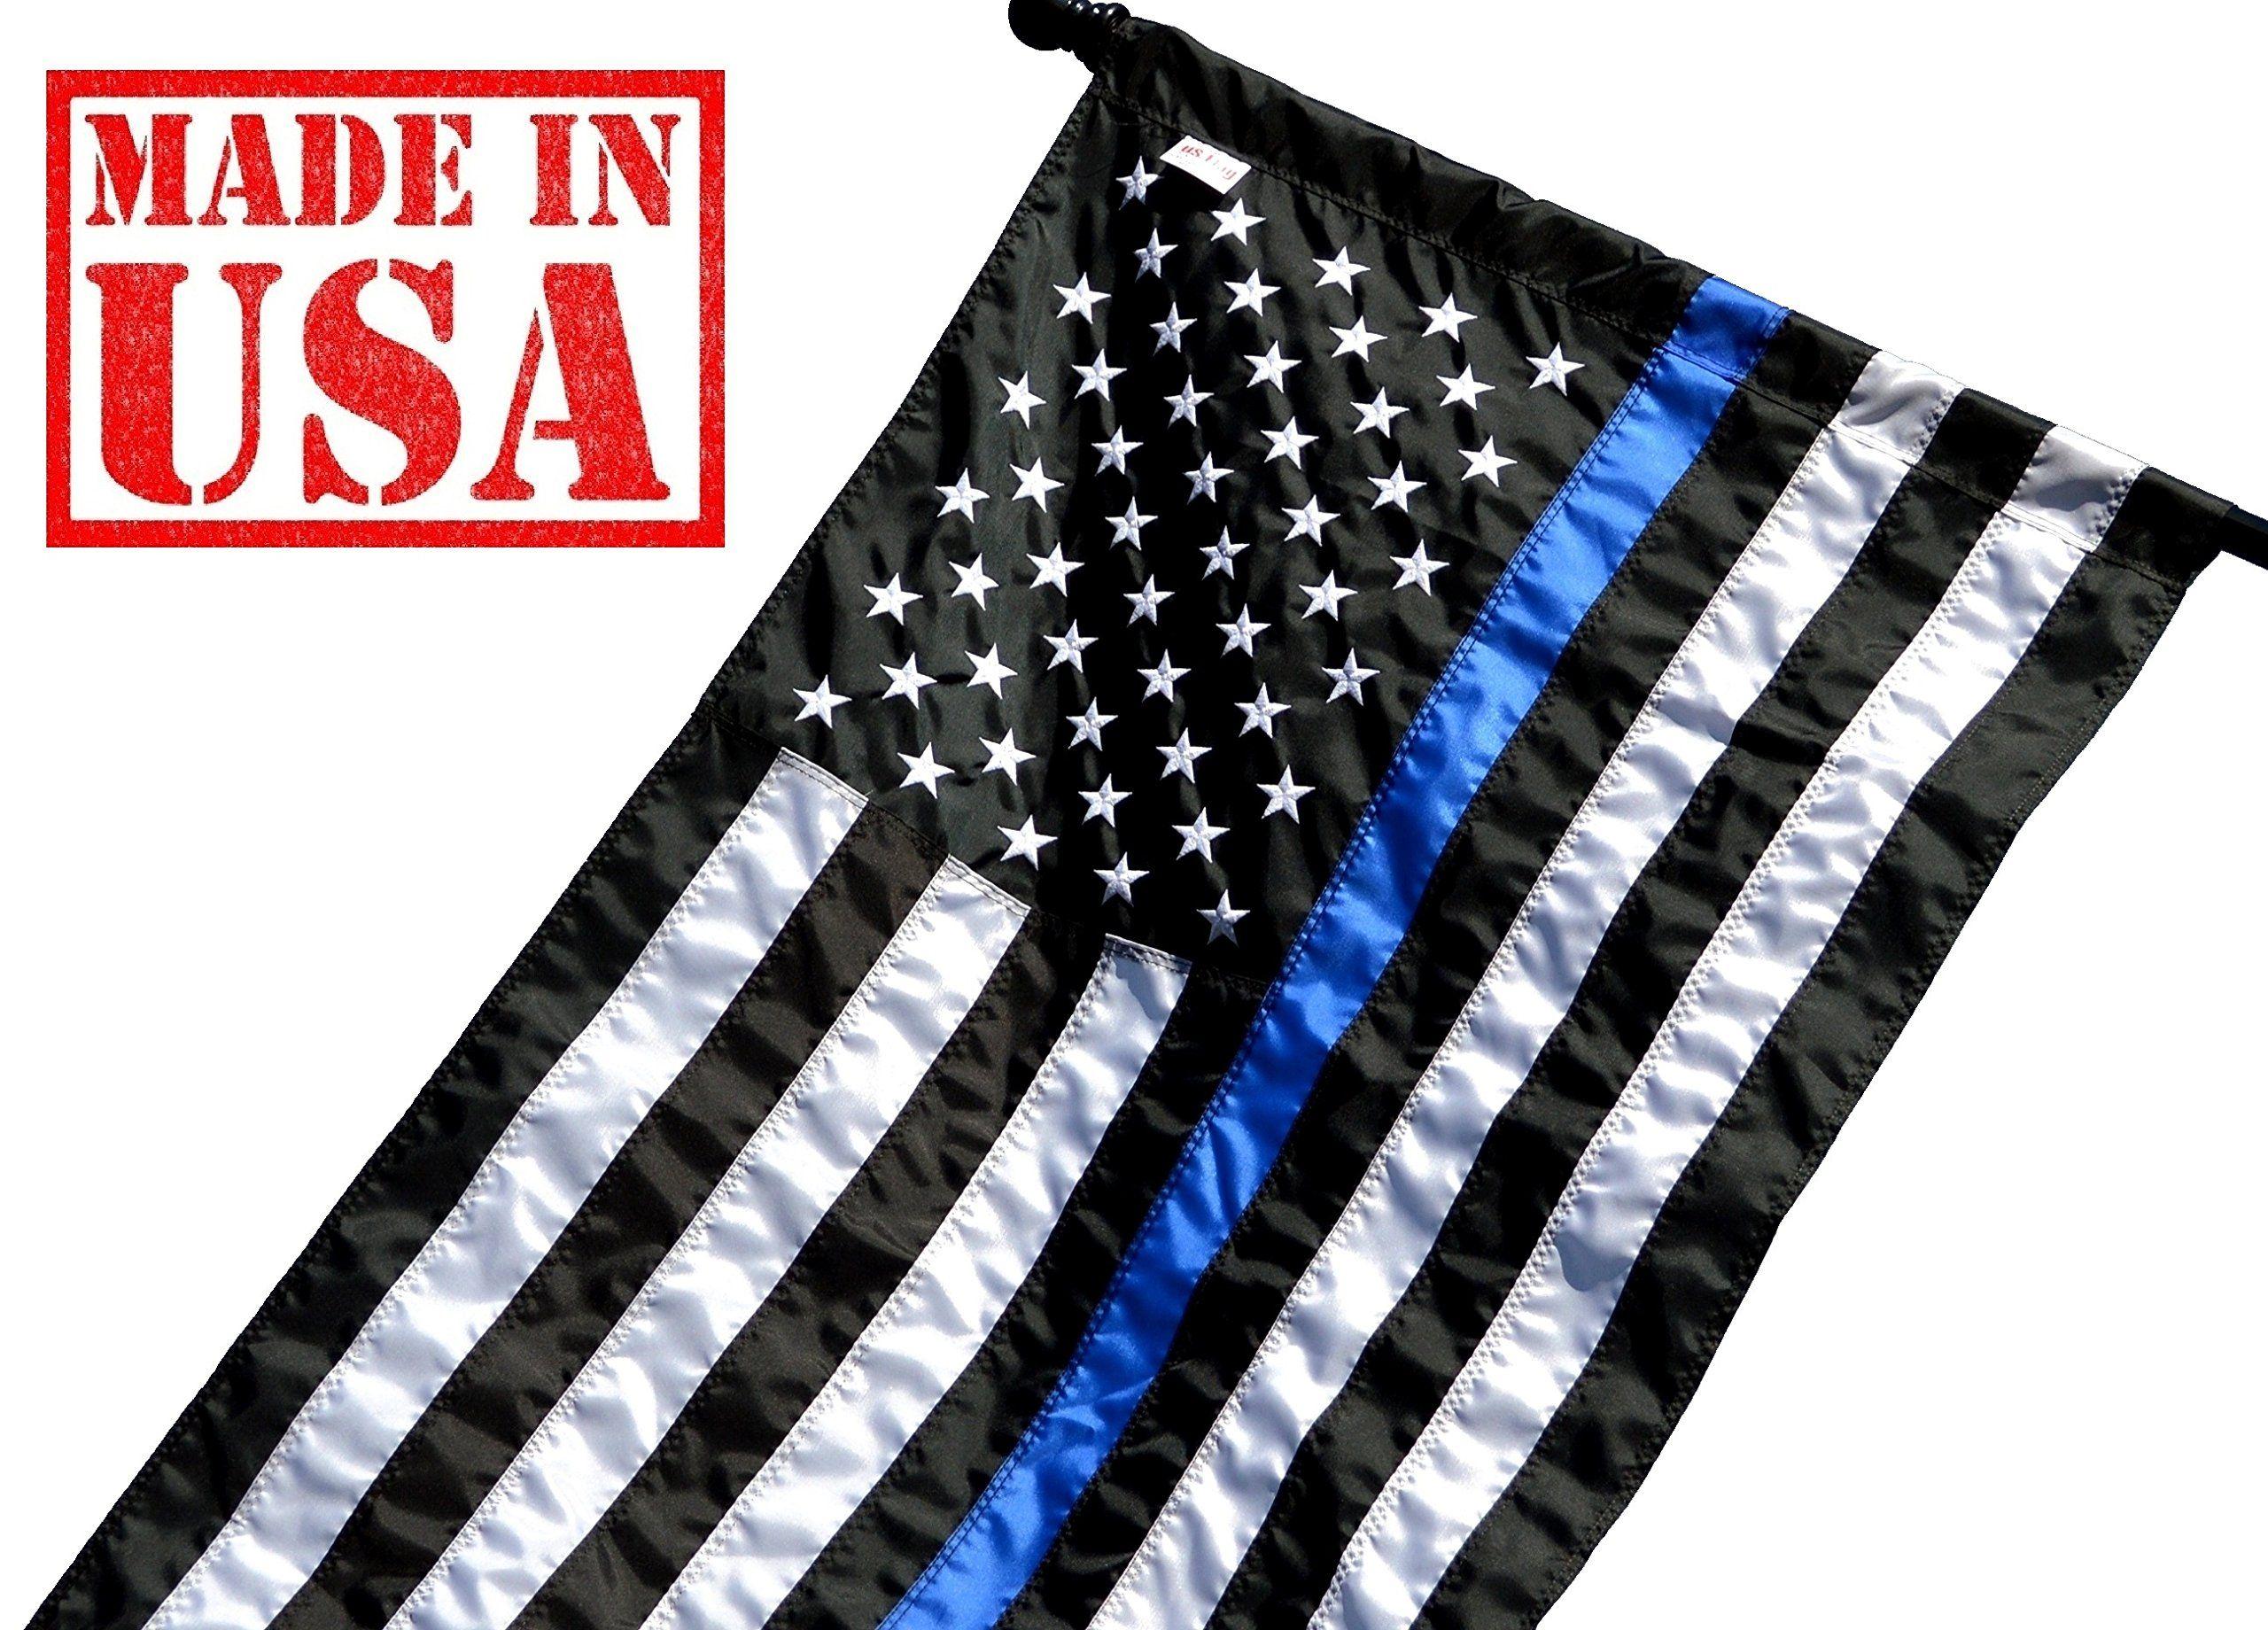 c4c37c504c4d US Flag Factory 2.5 x4  Thin Blue Line American Flag (Pole Sleeve ...